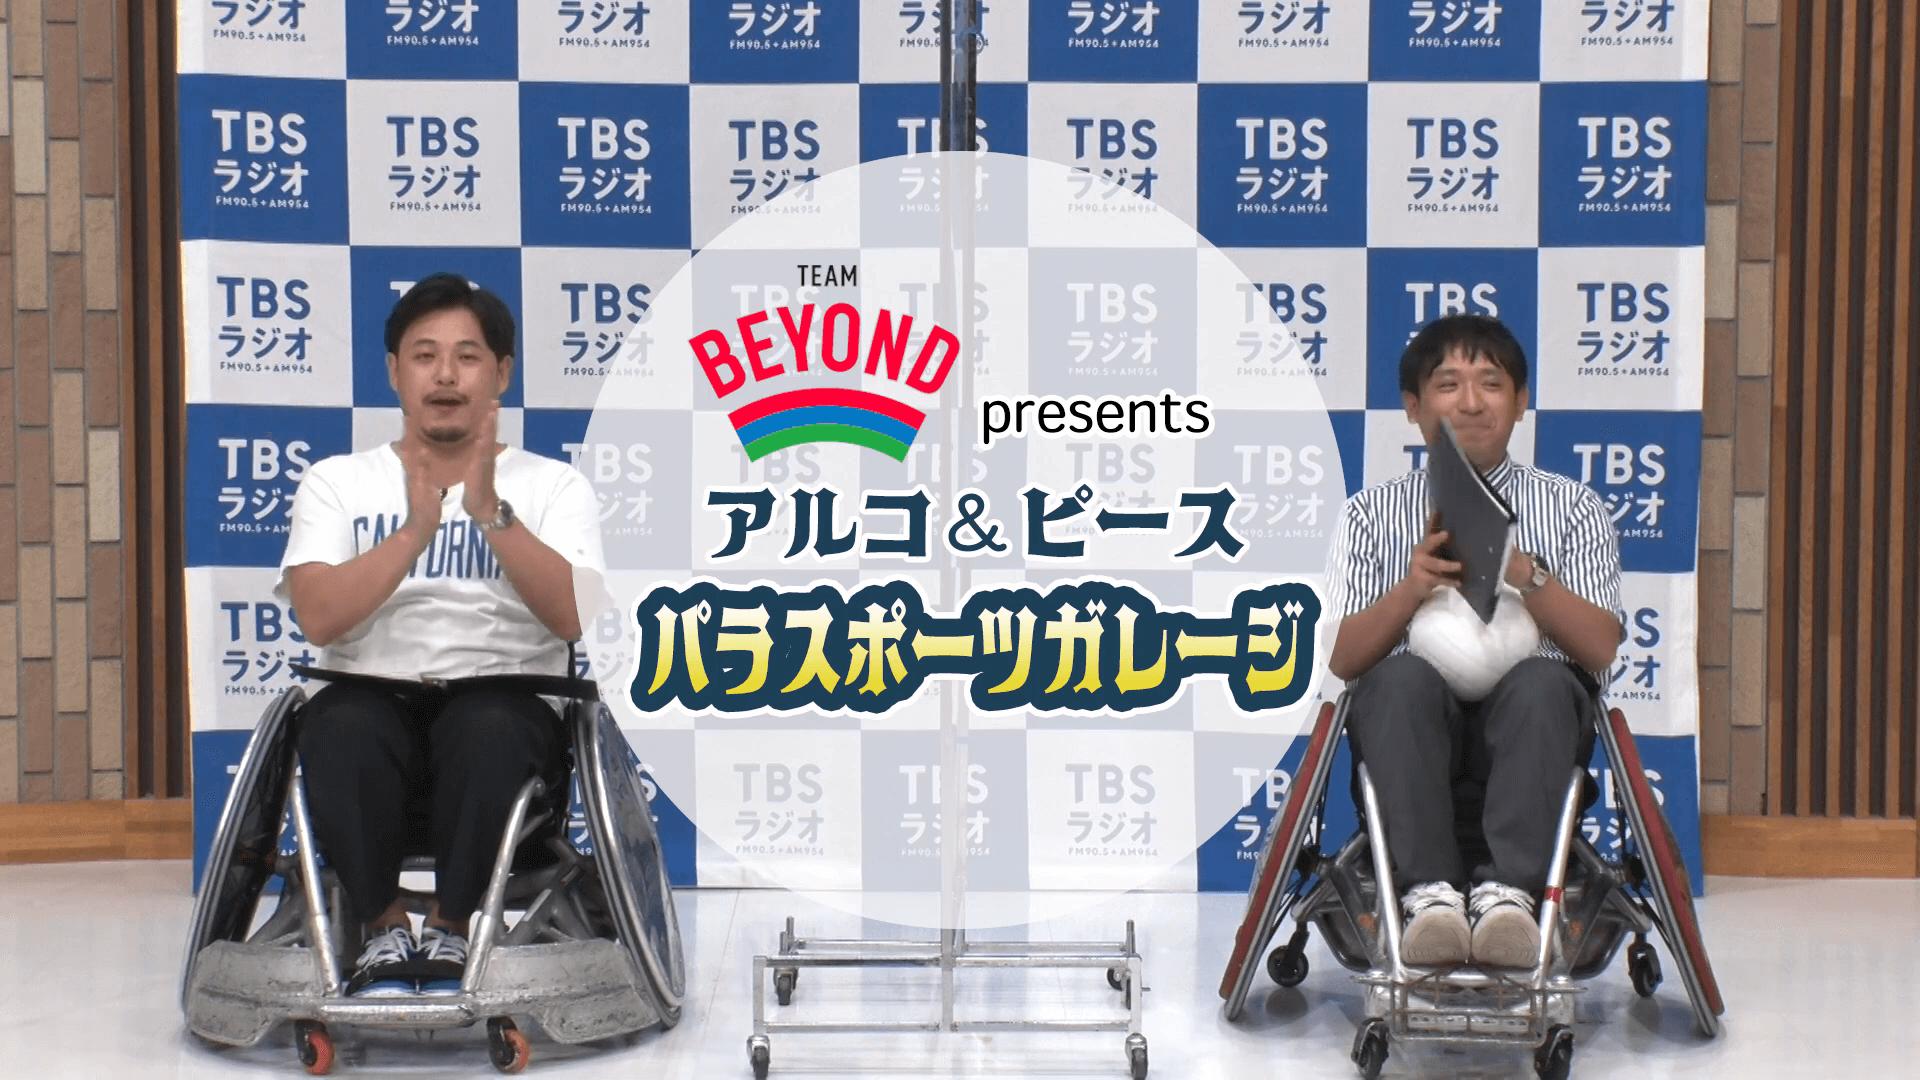 TEAM BEYOND presentsアルコ&ピース パラスポーツガレージが レギュラー化!